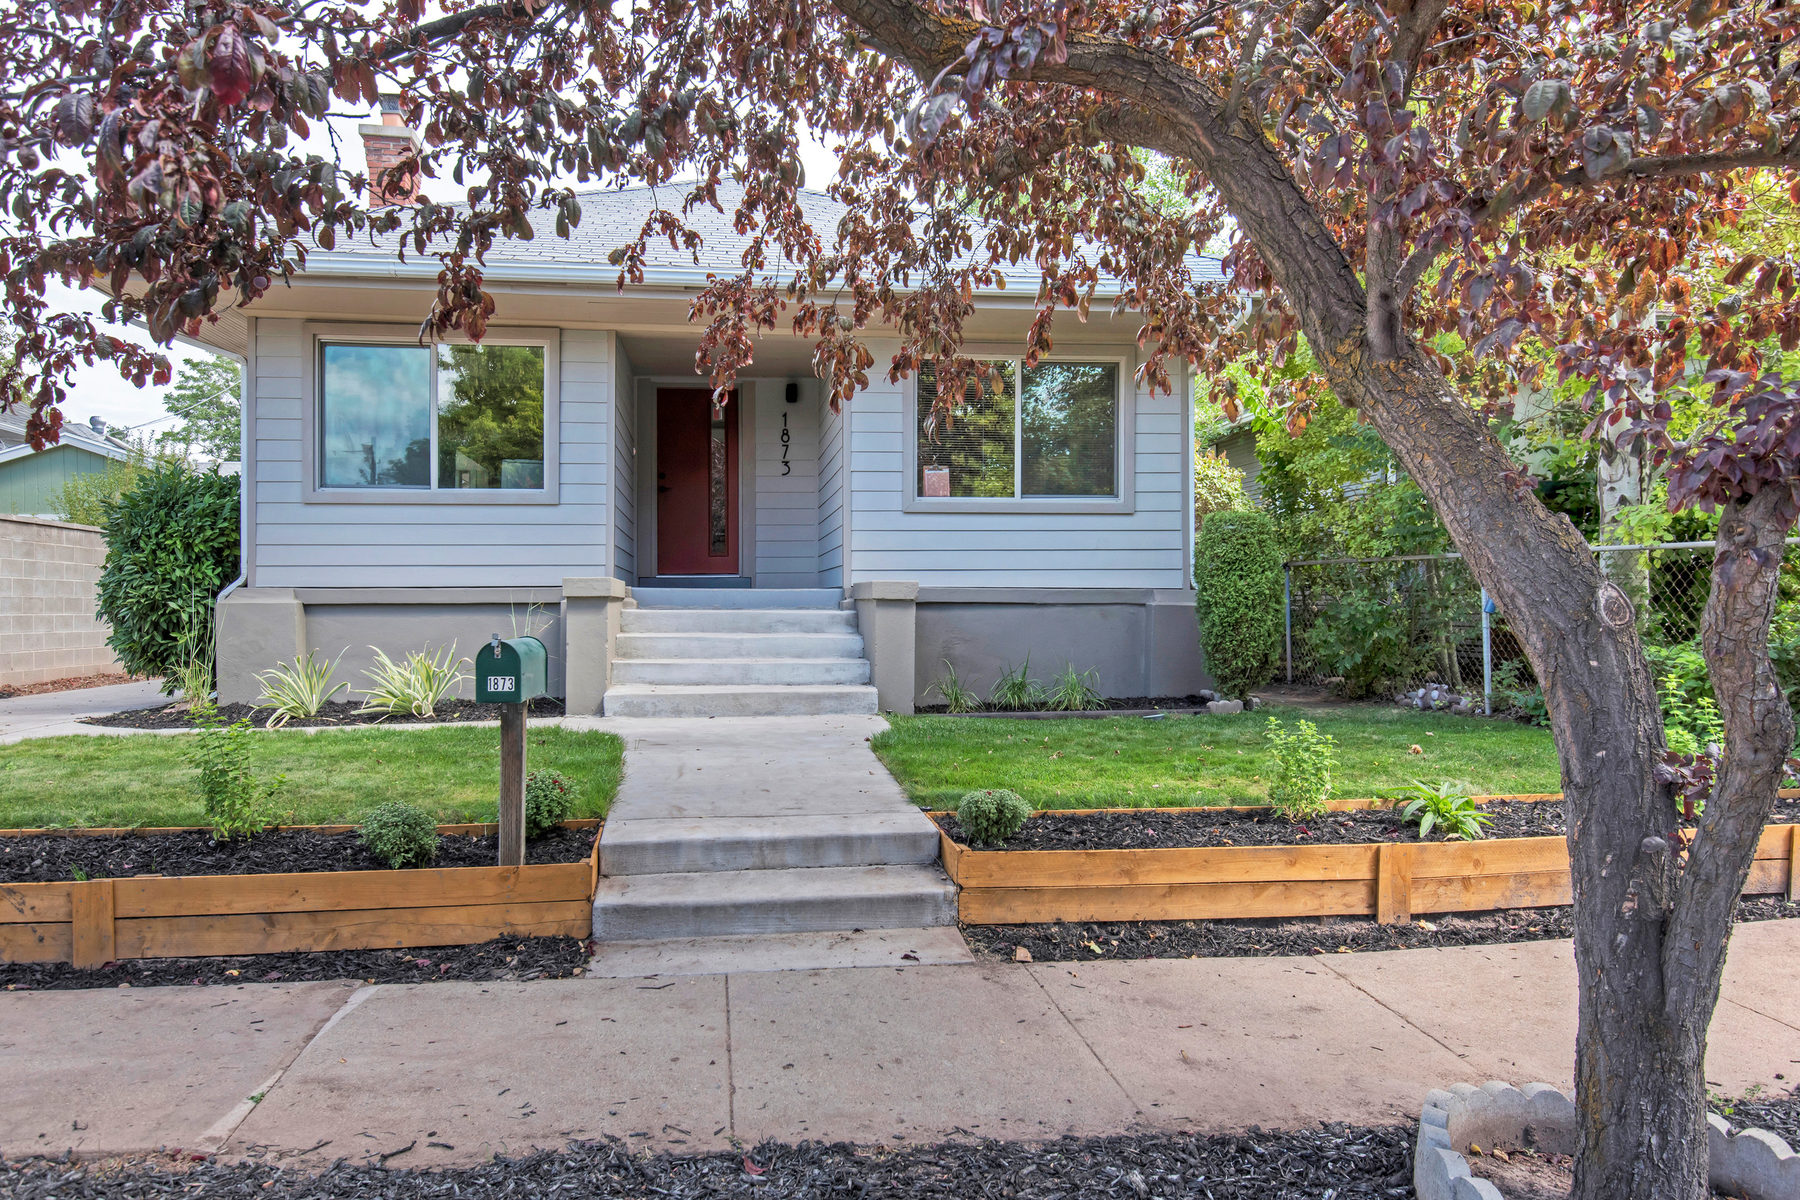 Villa per Vendita alle ore Lovable on Lincoln 1873 S Lincoln St Salt Lake City, Utah, 84105 Stati Uniti